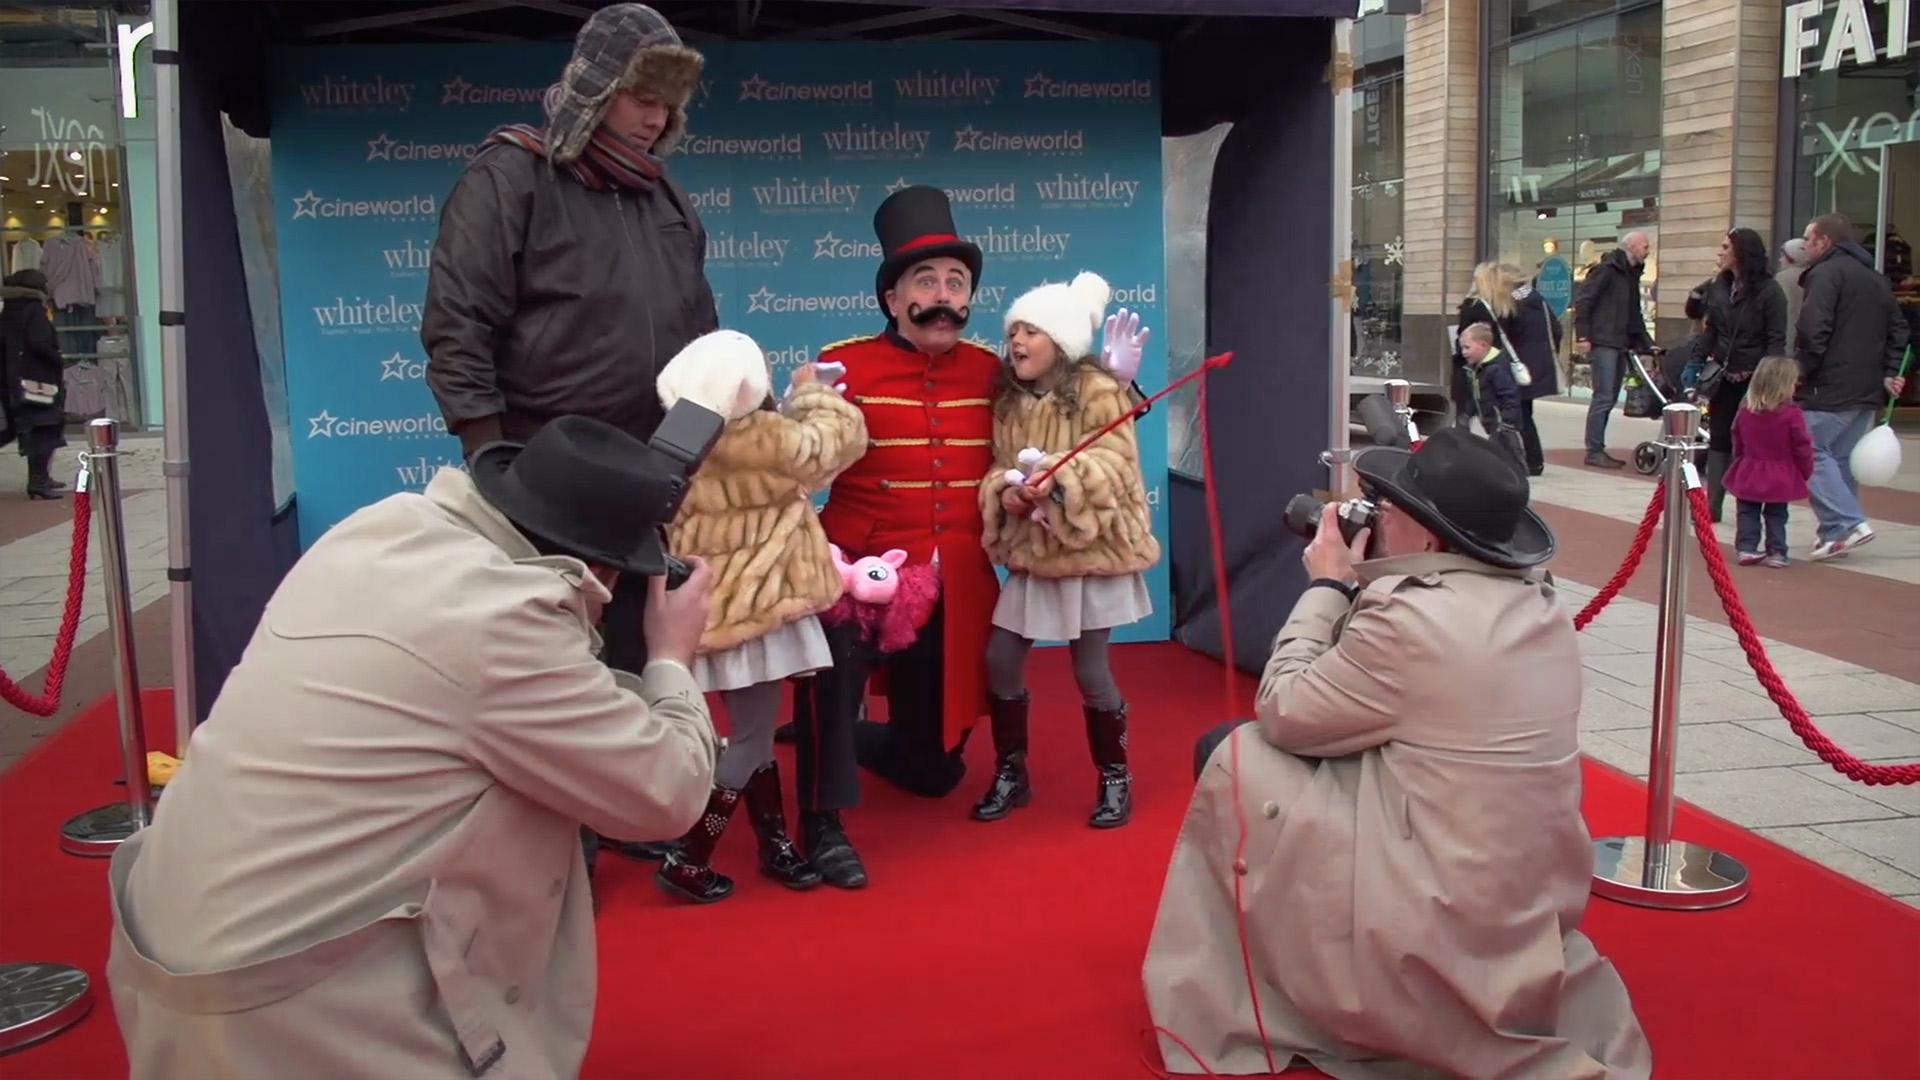 Whiteley Cineworld launch event photographers